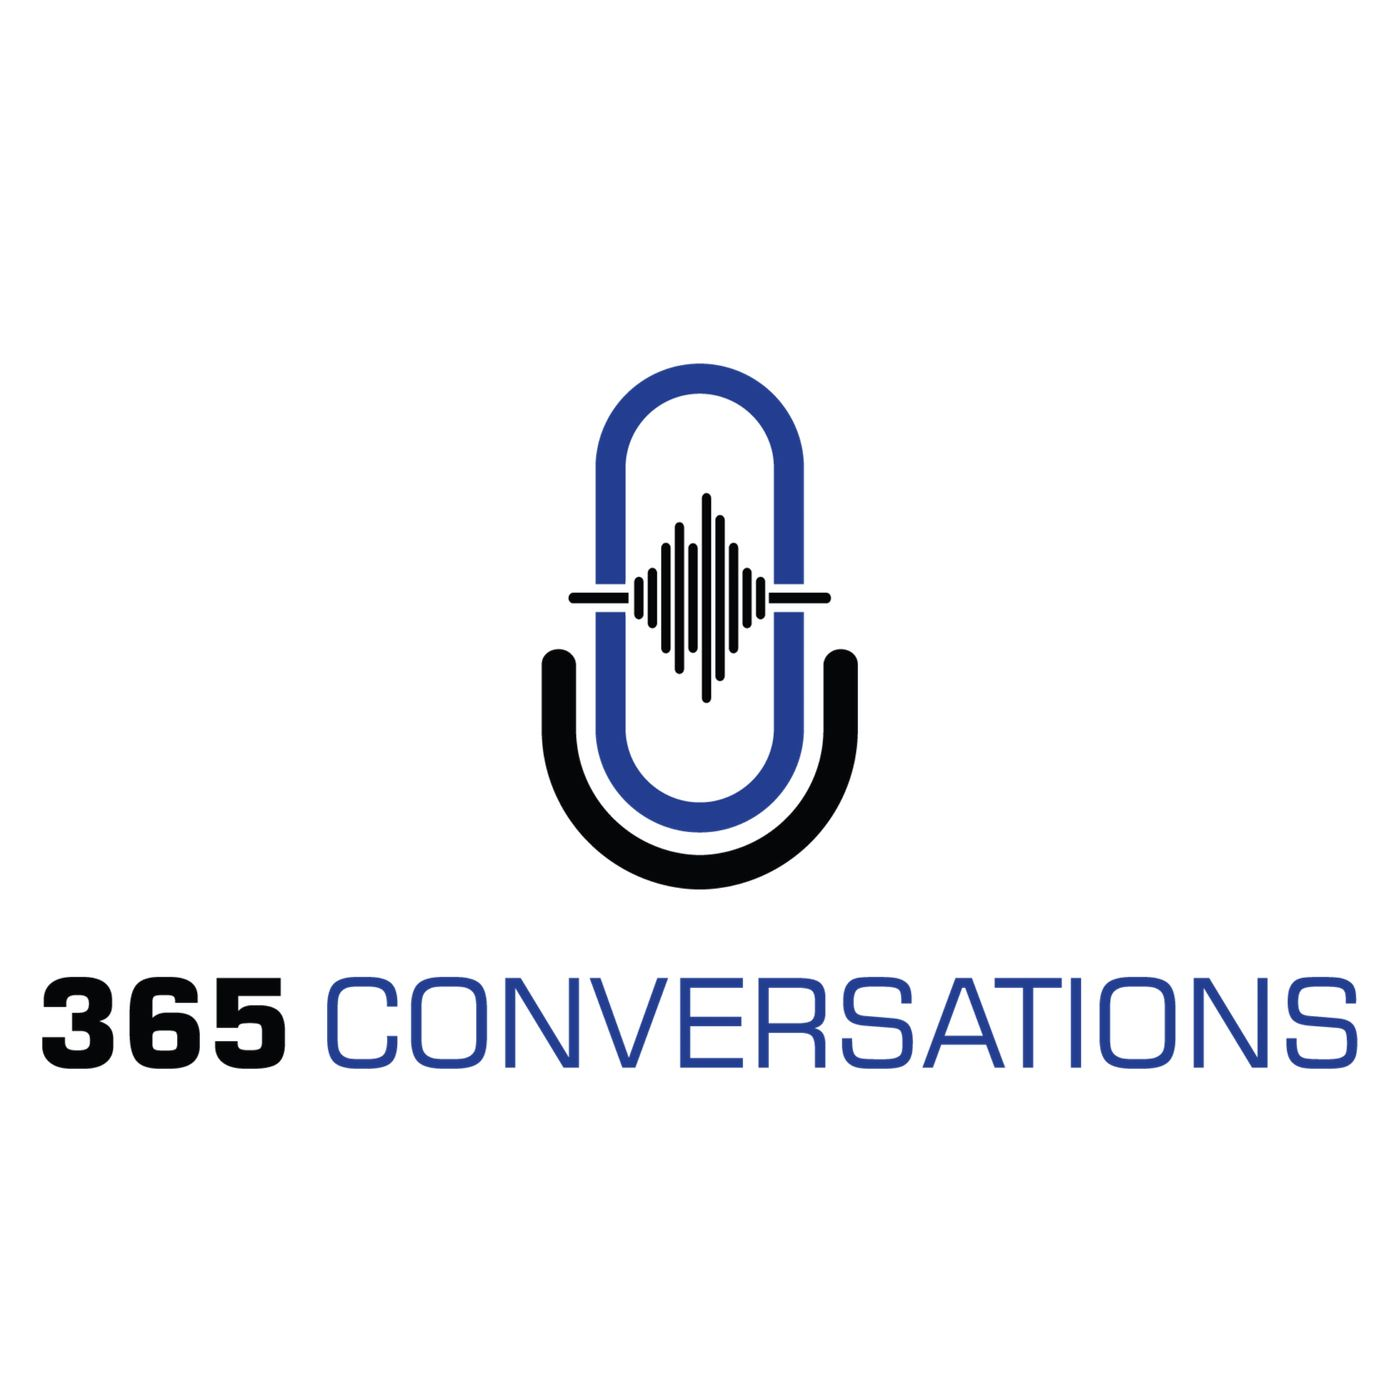 365 Conversations